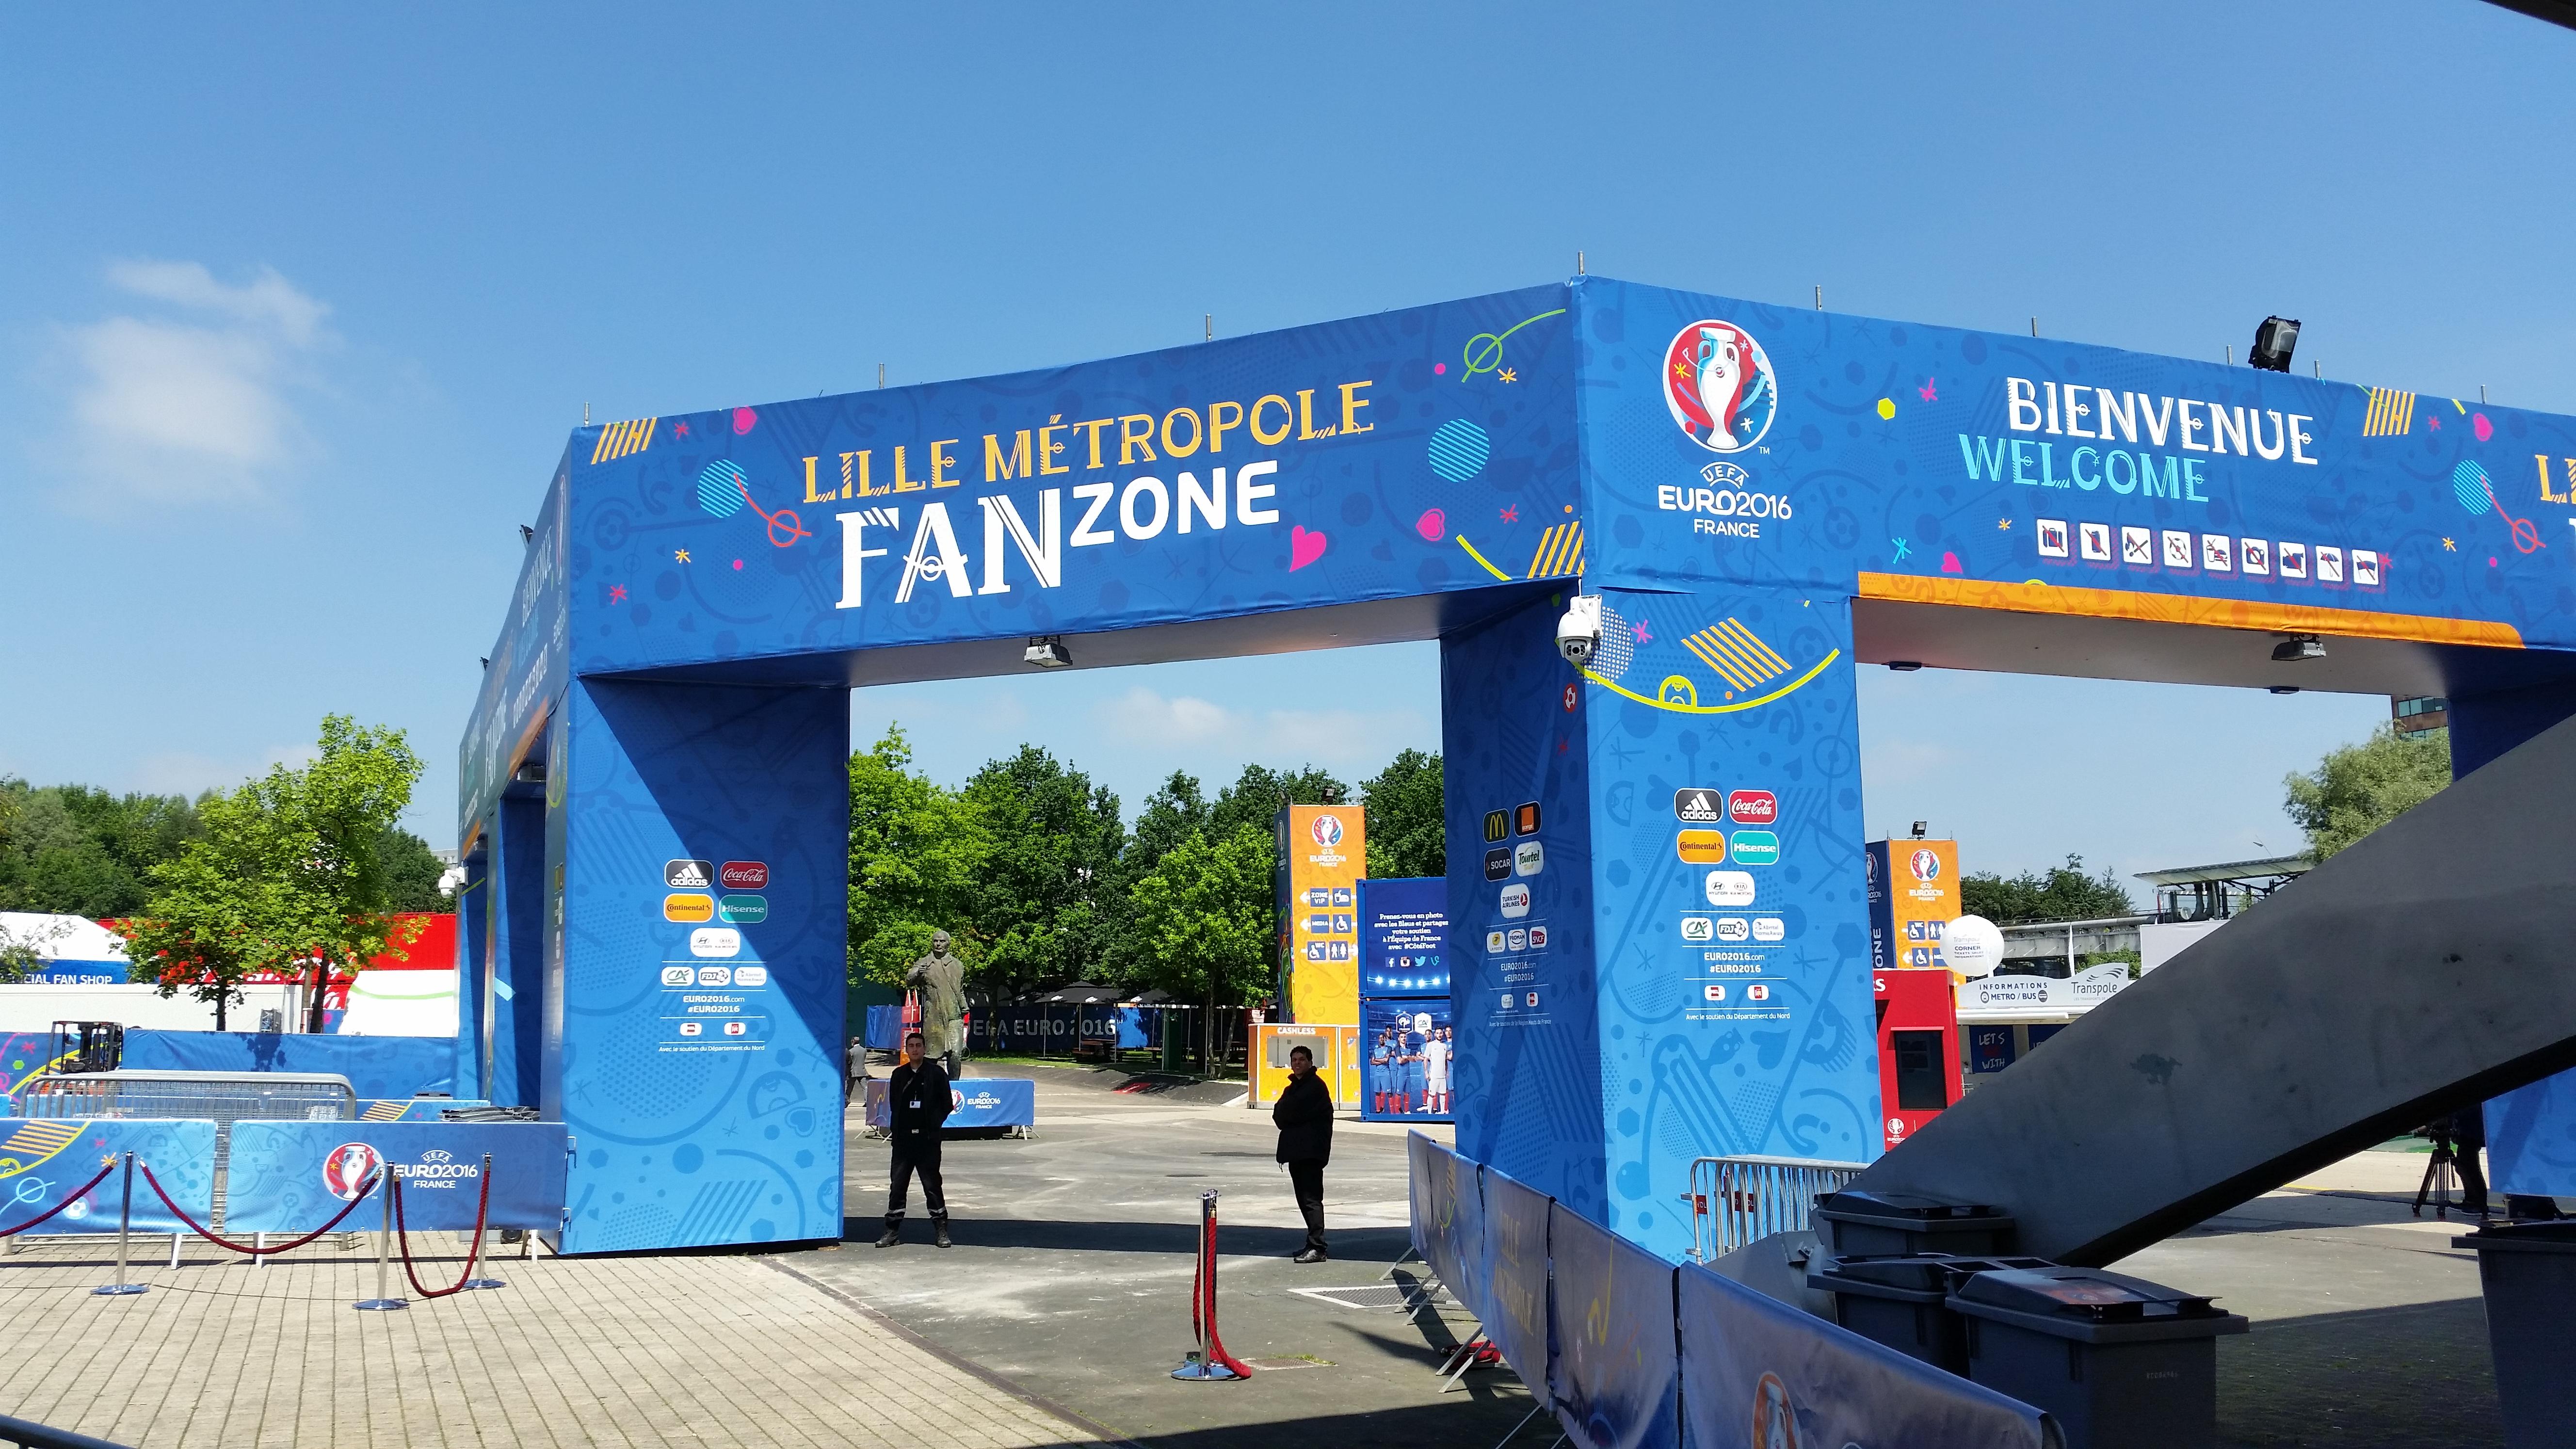 Euro 2016 inauguration et visite de la fan zone lille m tropole zoom sur - Metro lille braderie ...